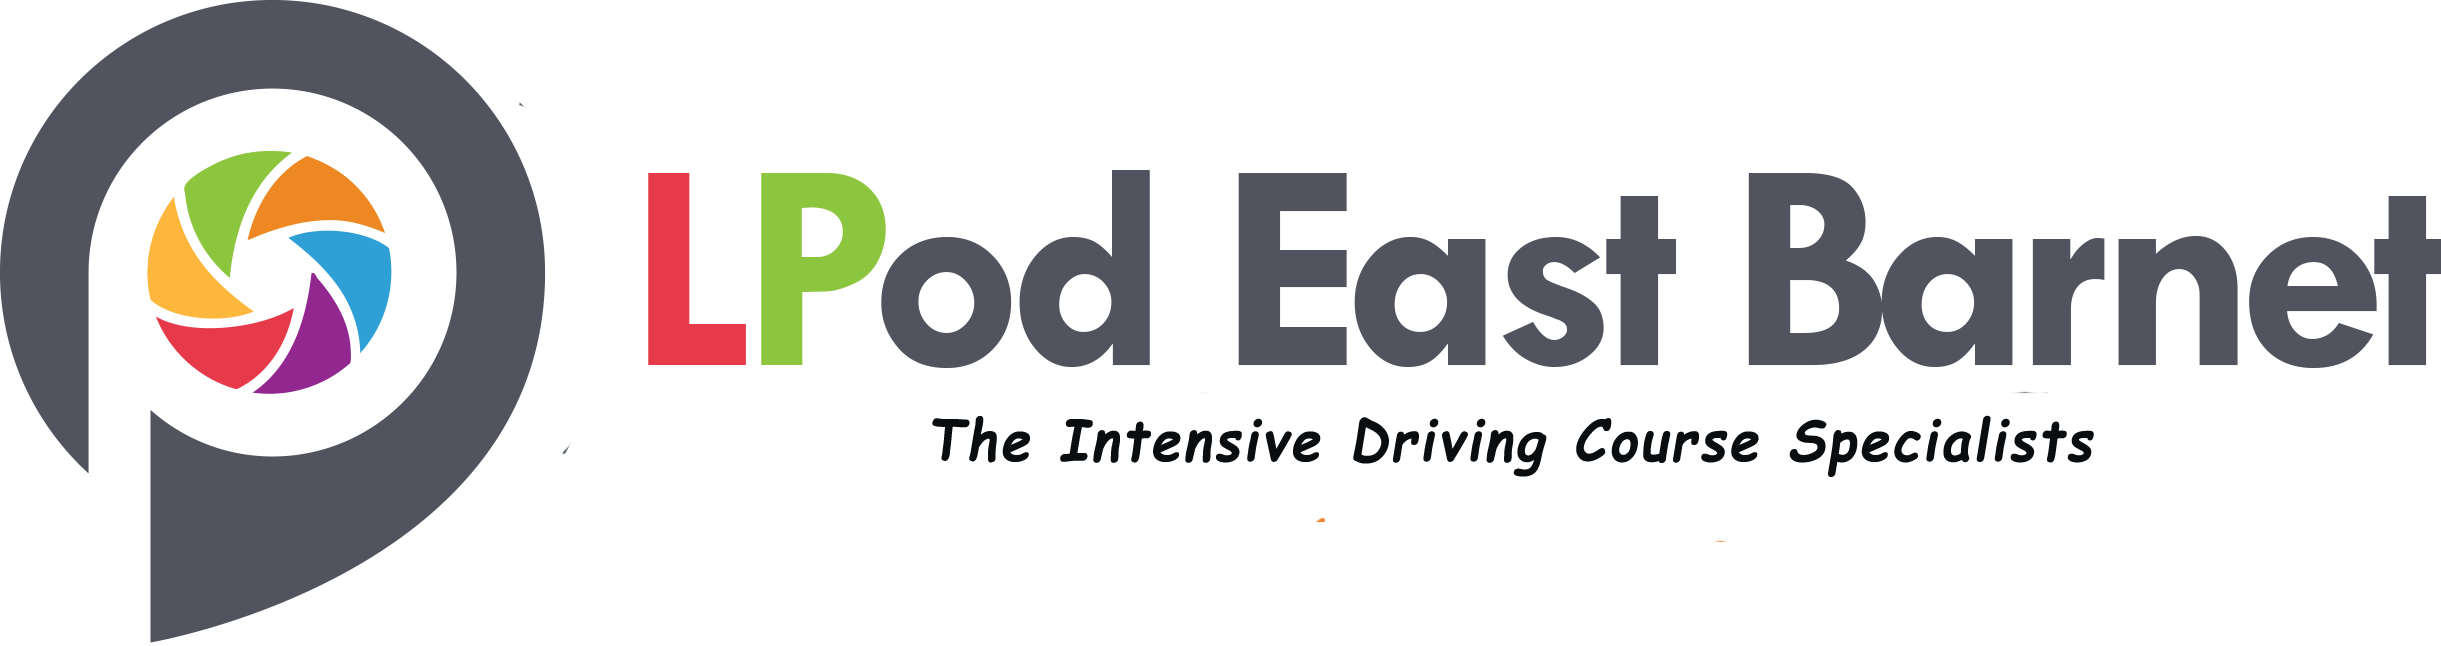 intensive driving courses east barnet, intensive driving school east barnet, one week driving course east barnet, fast pass driving east barnet, crash driving course east barnet